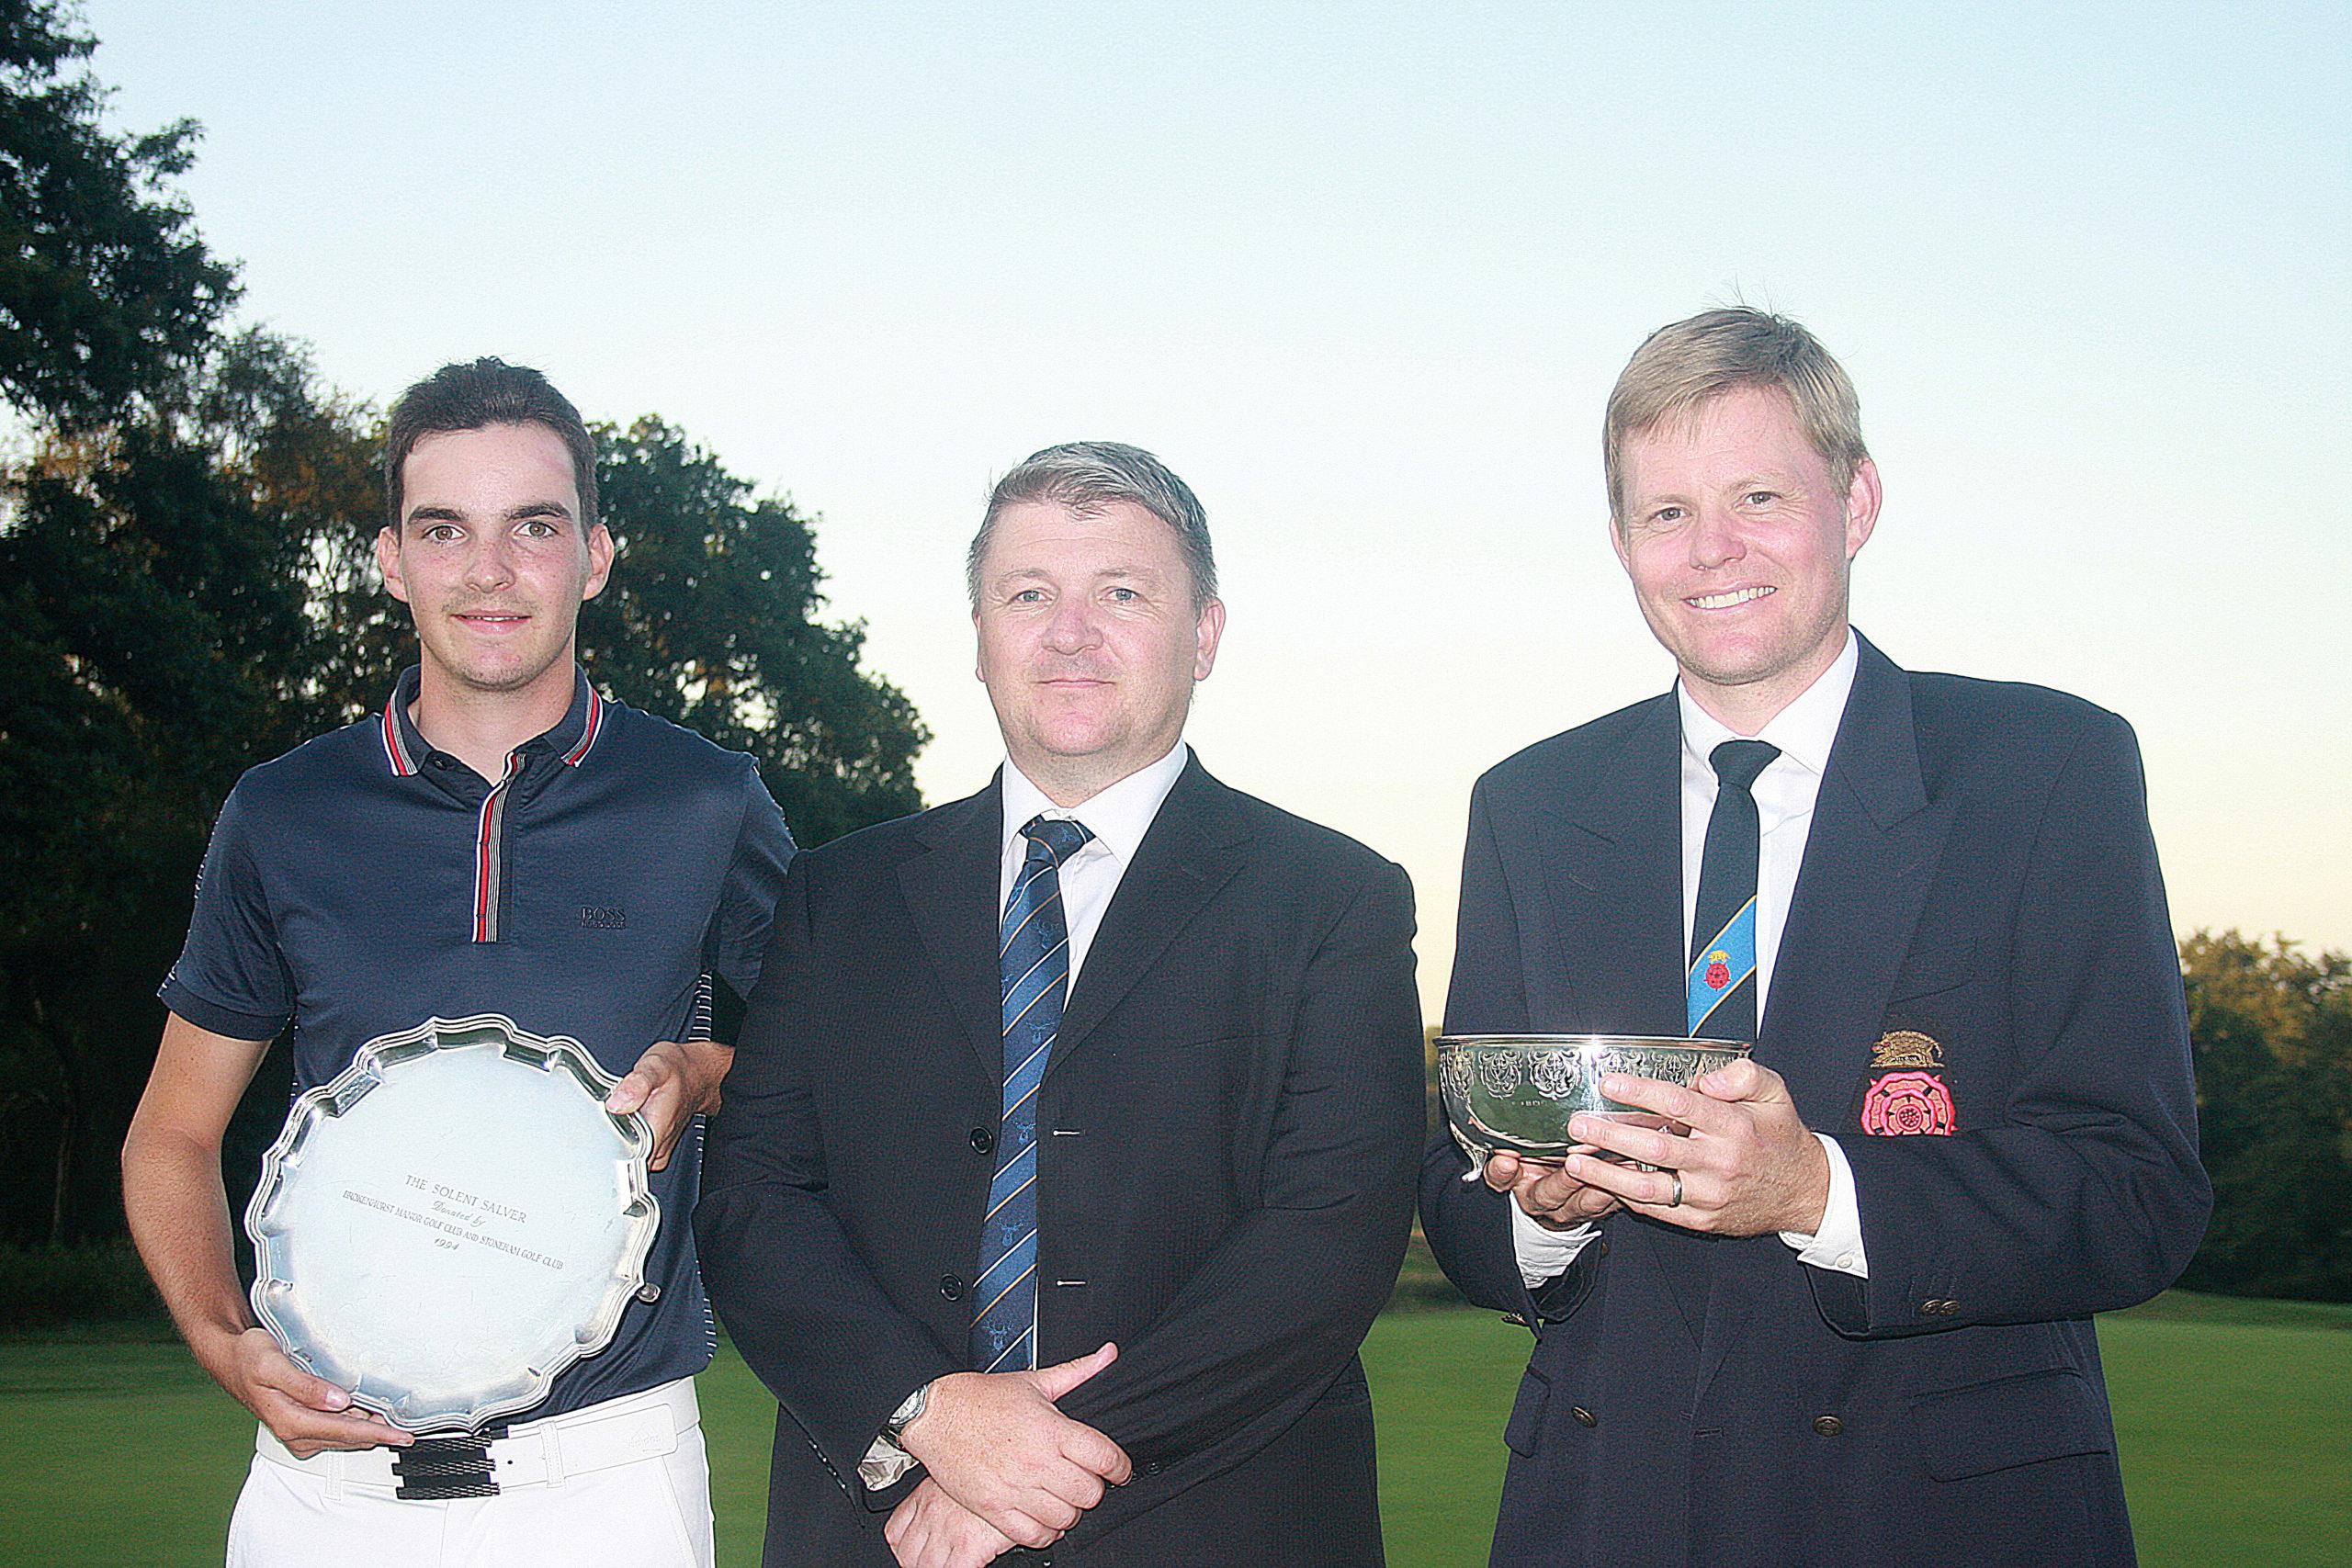 Stoneham Trophy winner Ryan Henley